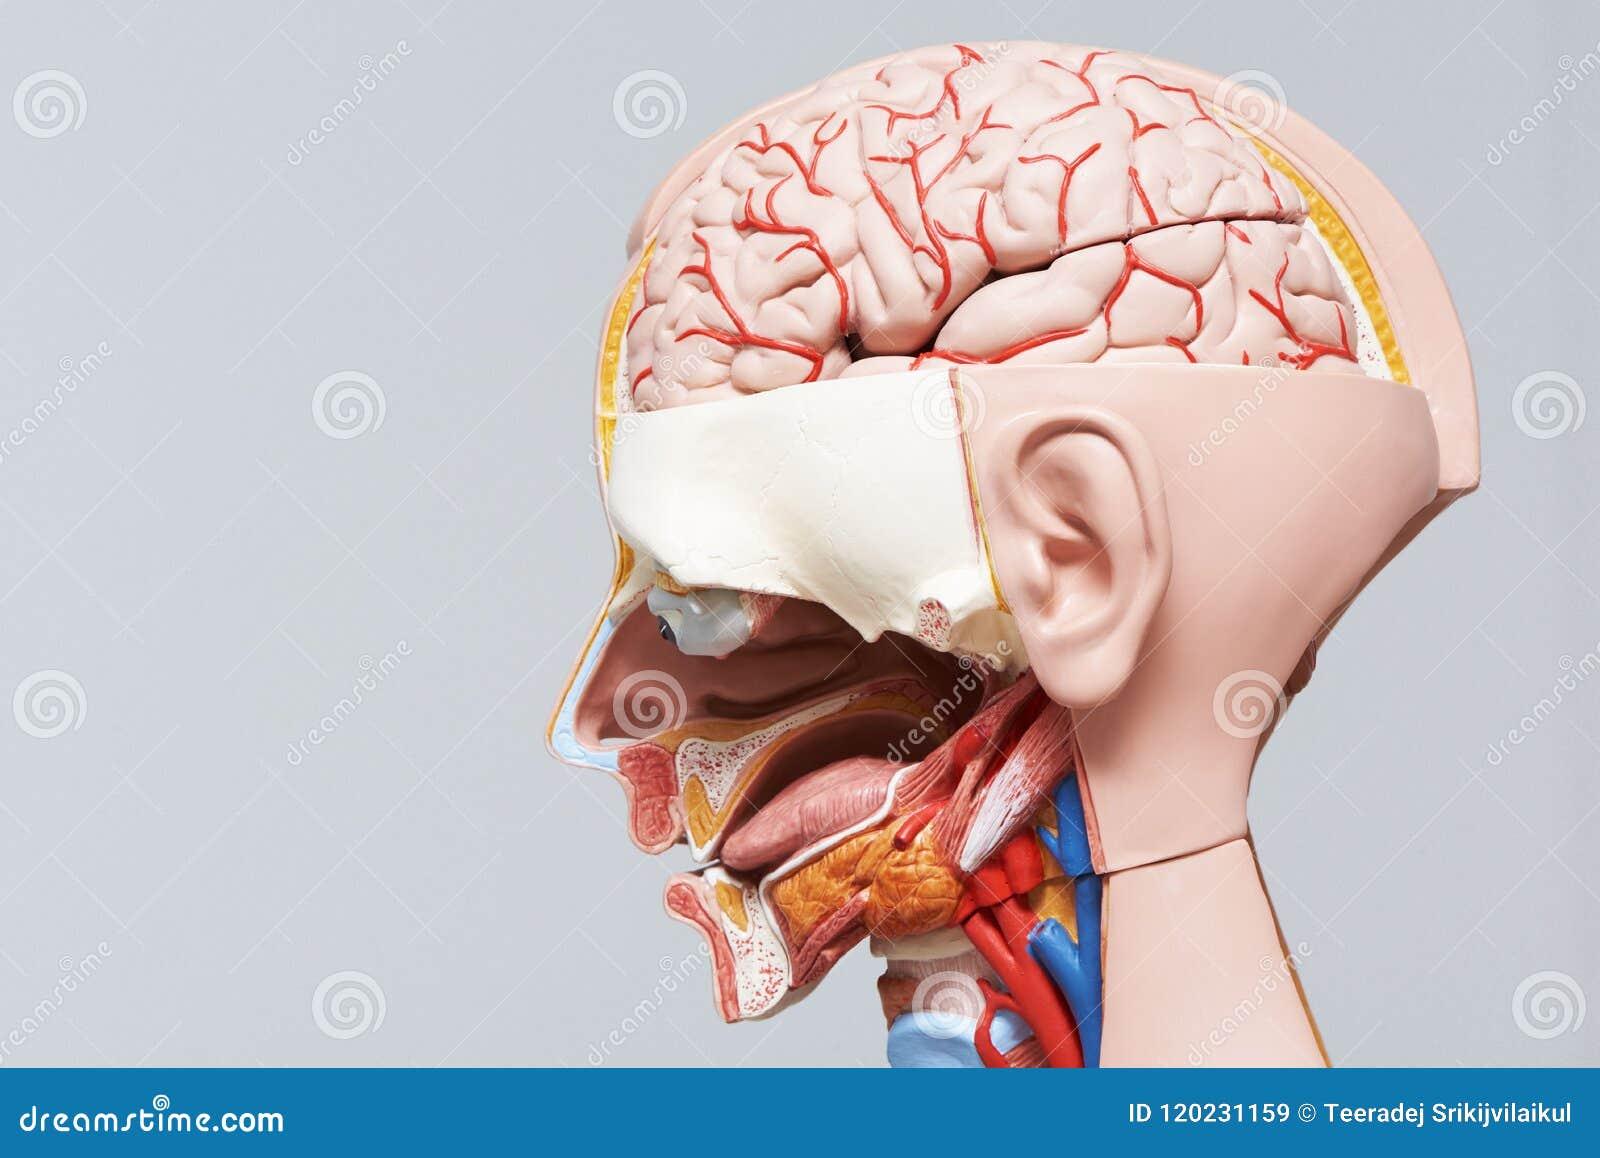 Human Head And Neck Anatomy Model Stock Image Image Of Background